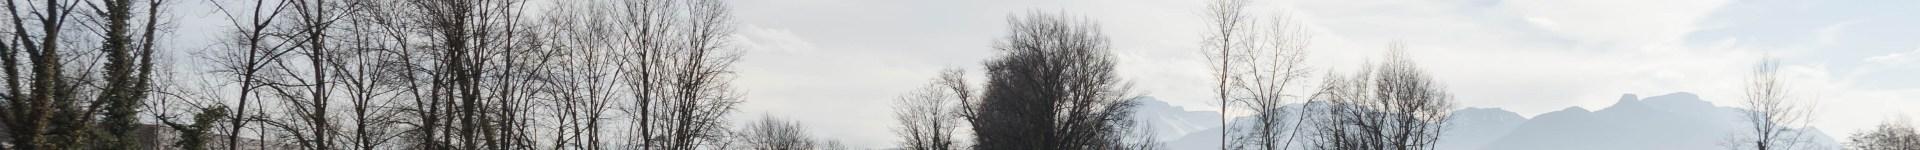 La Motte-Servolex – Pré Lombard